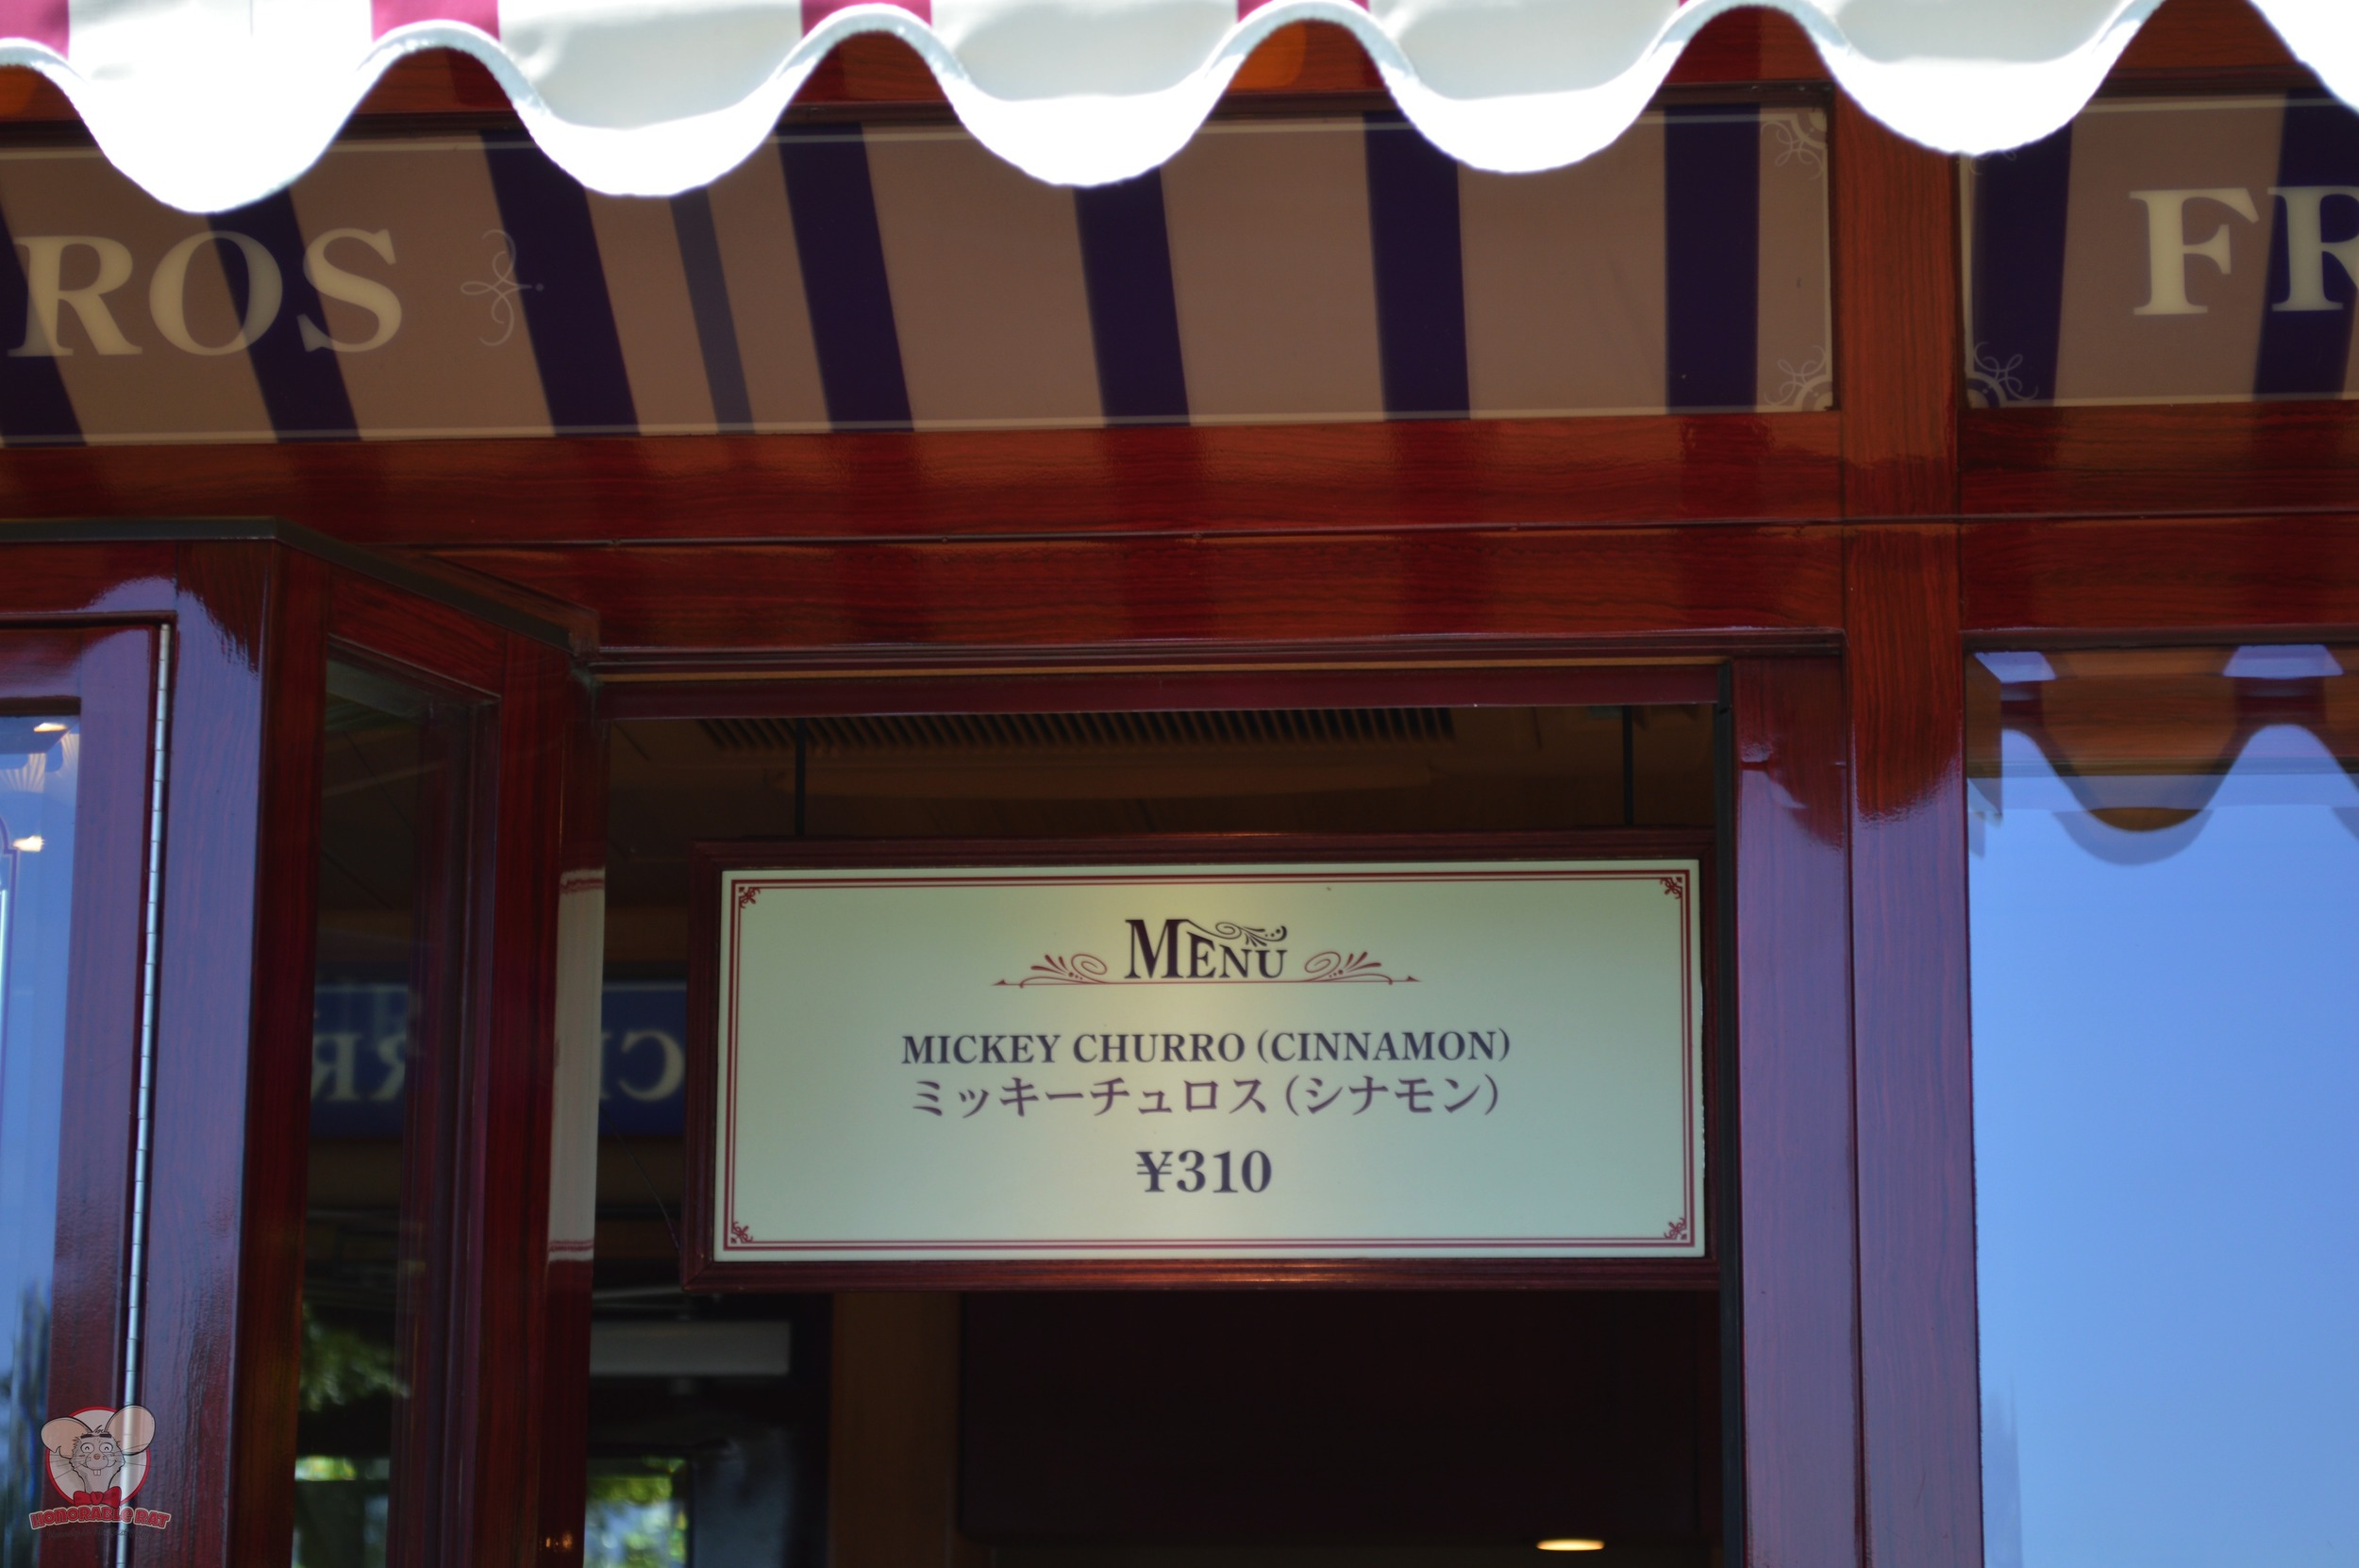 Mickey Churro (Cinnamon) for 310 yen